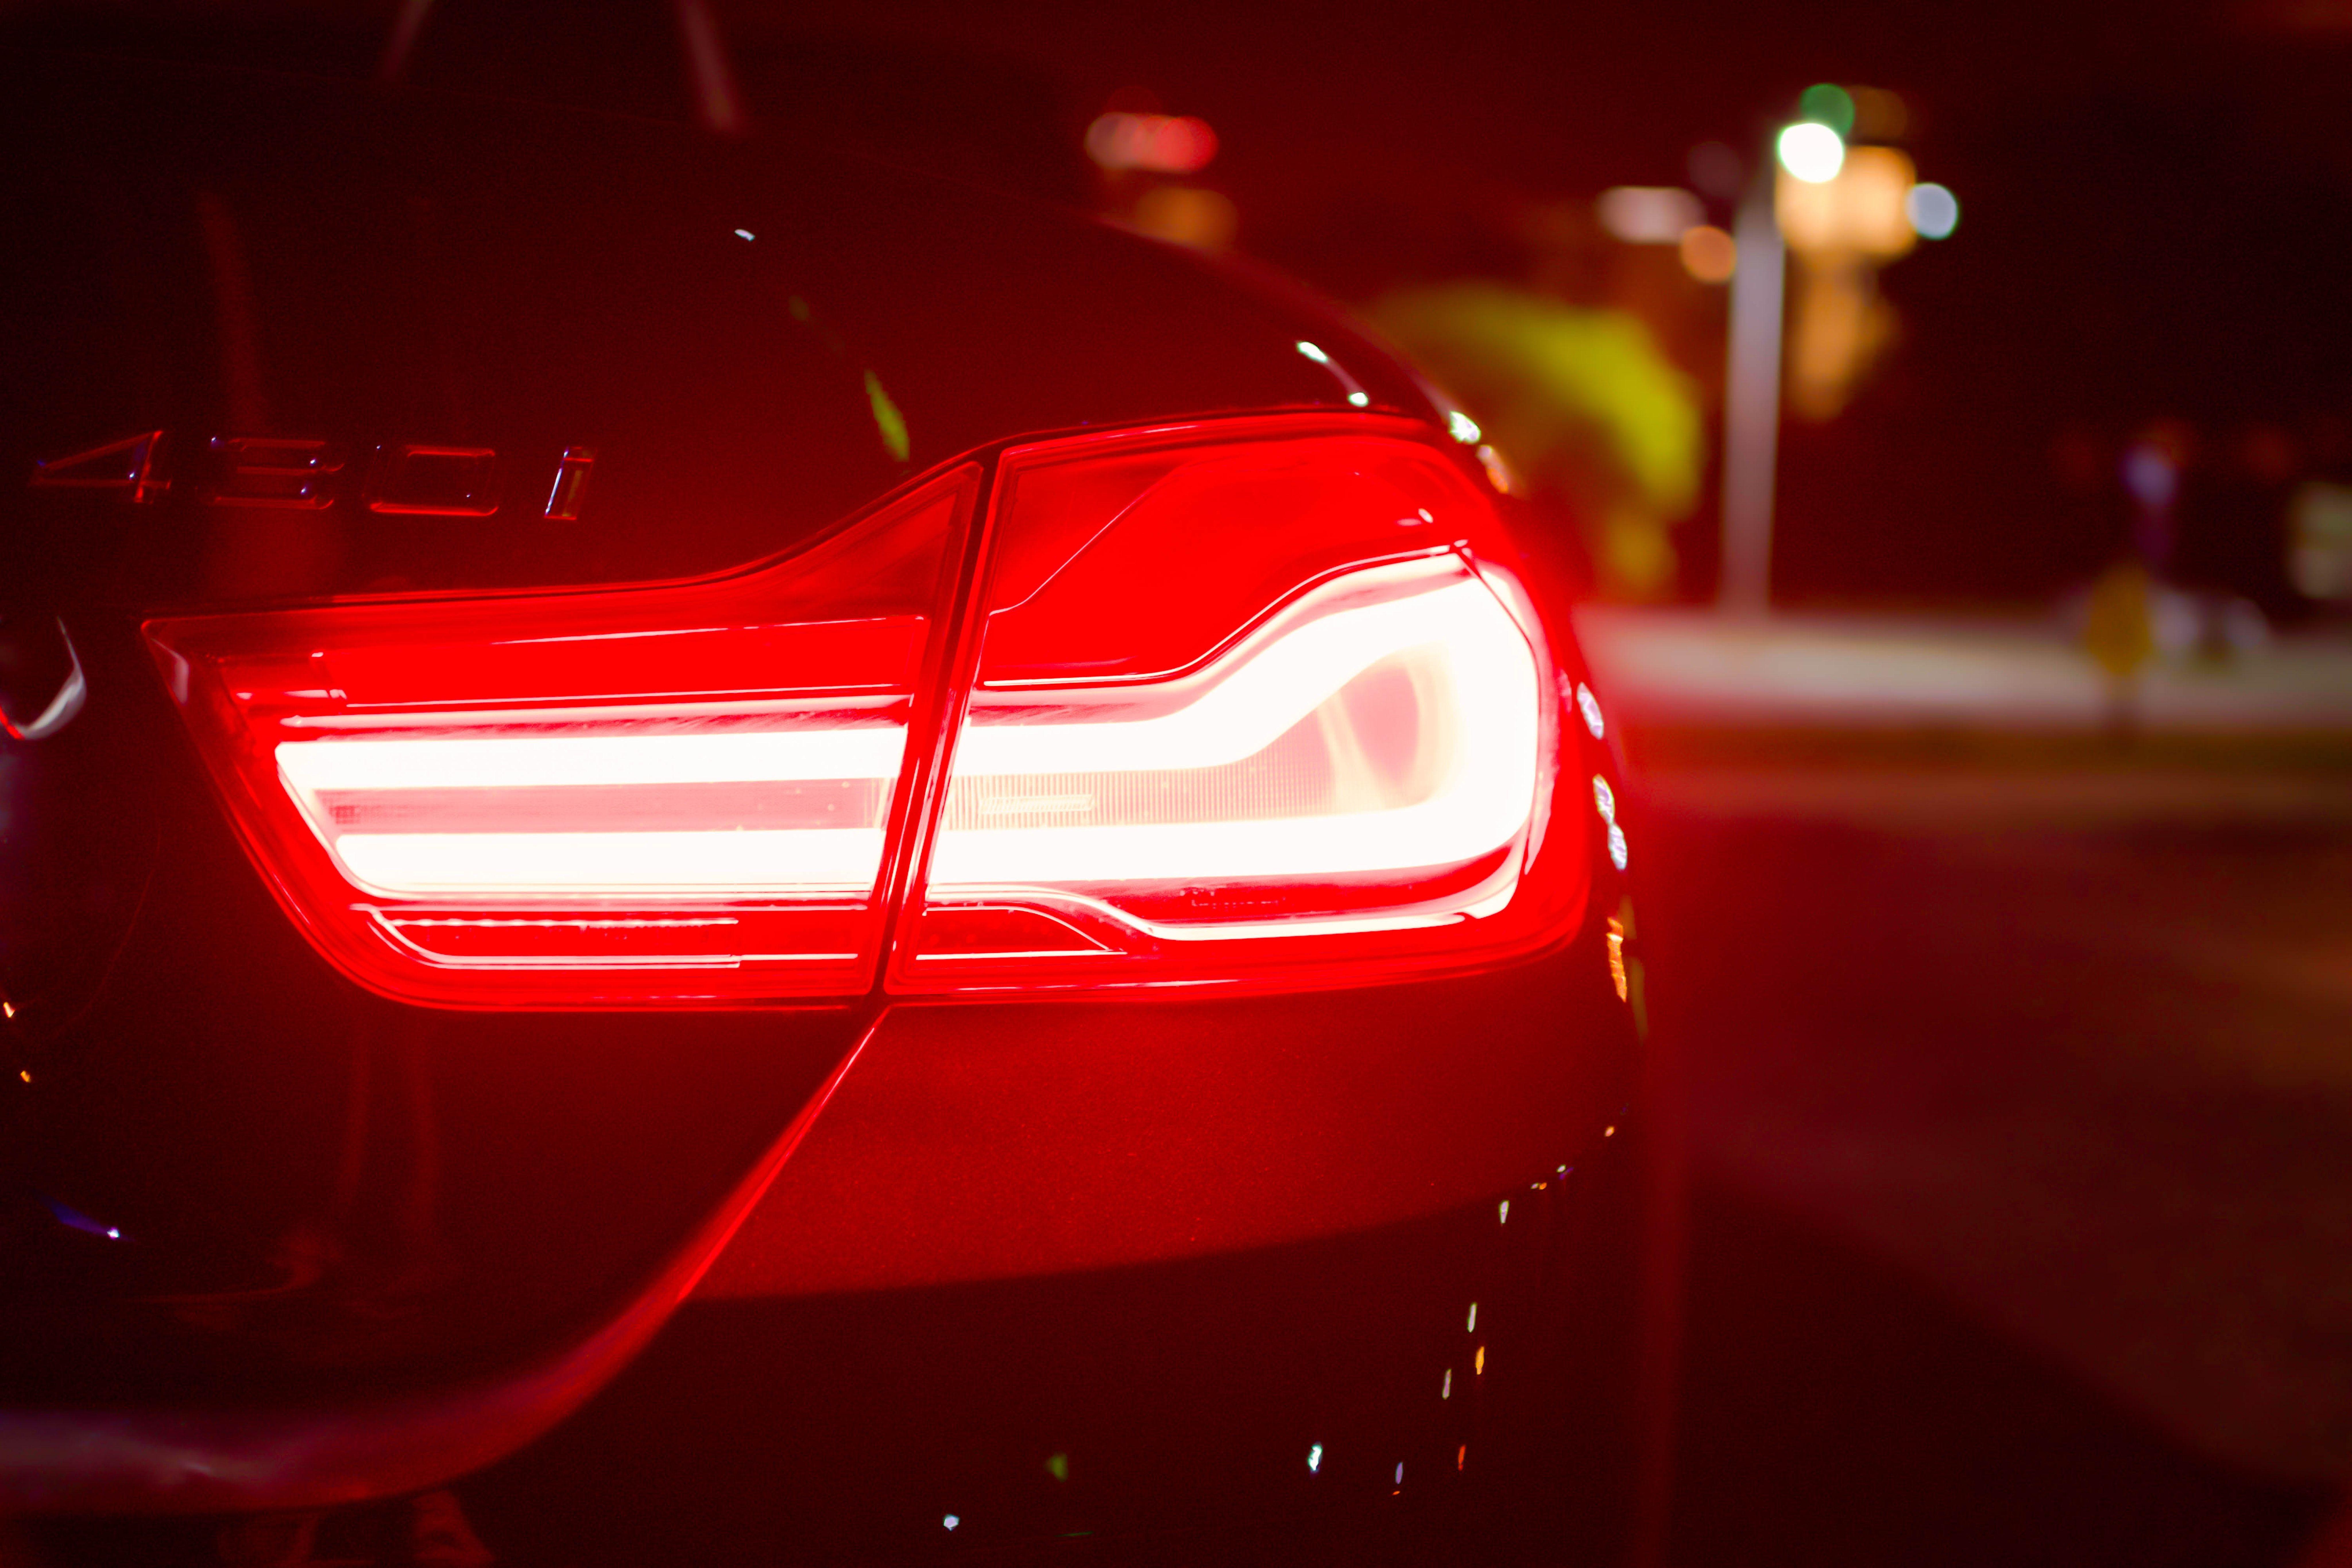 Car Light Car Backlight Light And Red Light Hd Photo By Jesse Collins Jtc On Unsplash Tail Light Car Lit Wallpaper